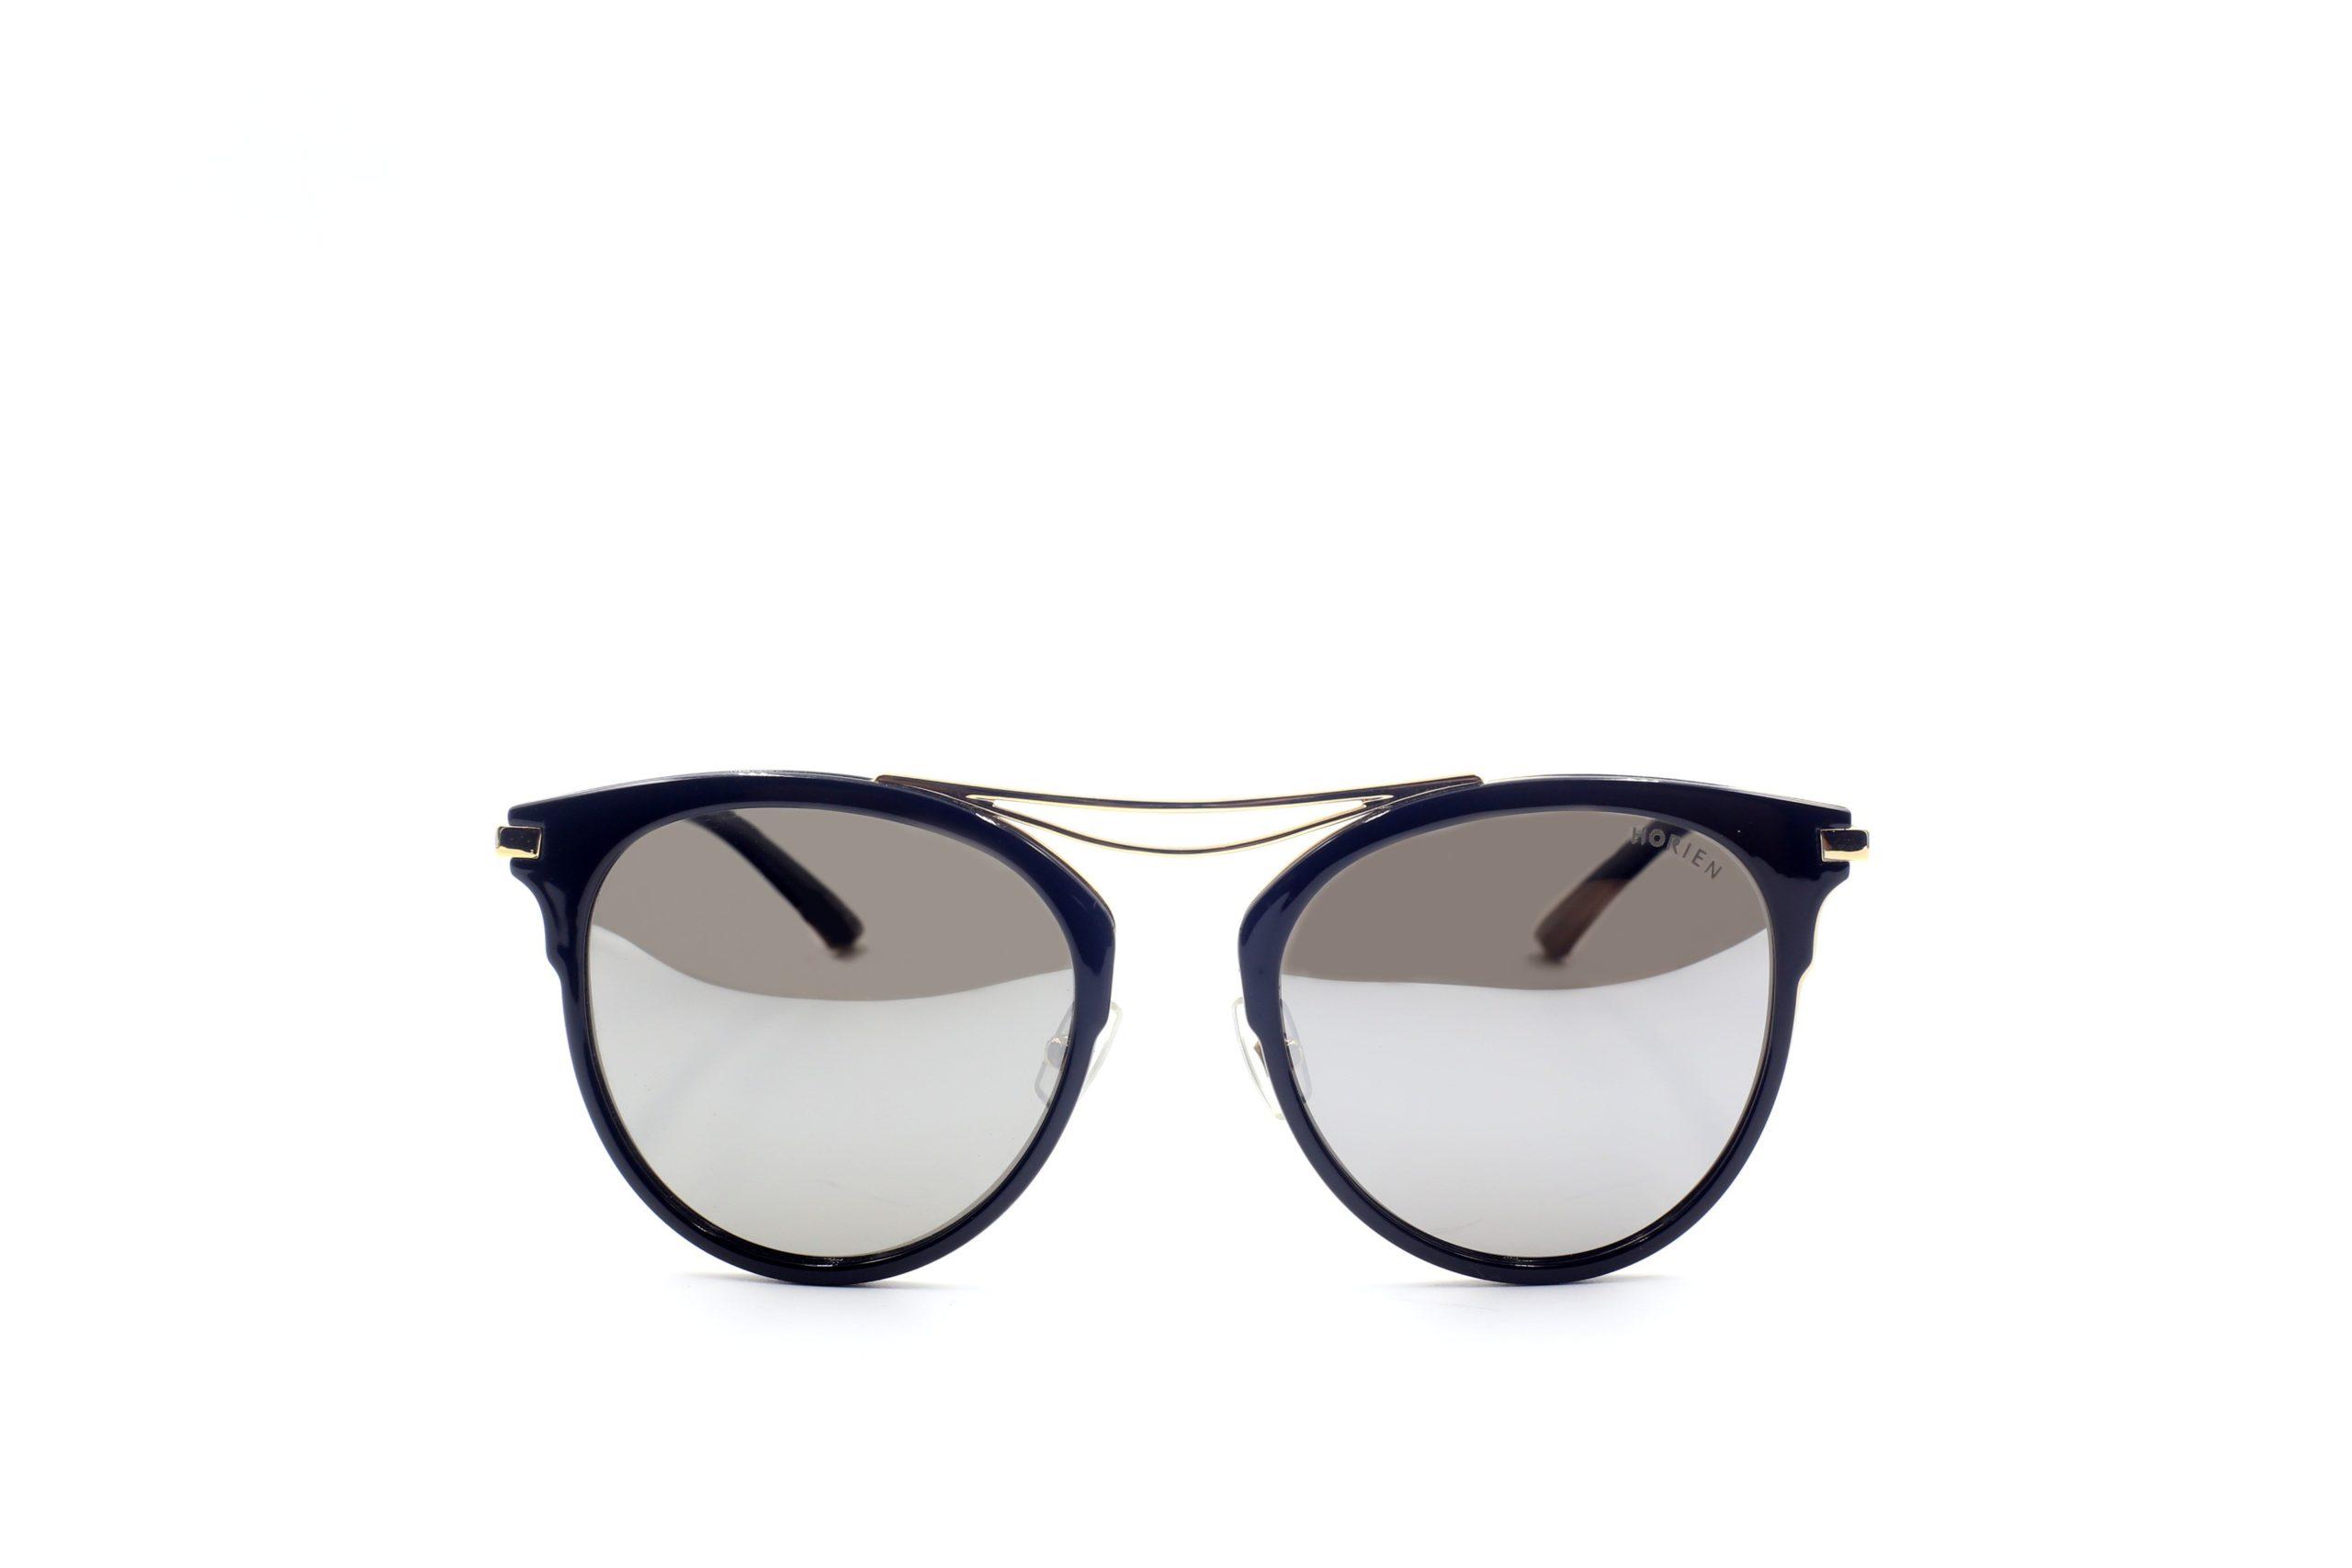 kacamata hitam kekinian